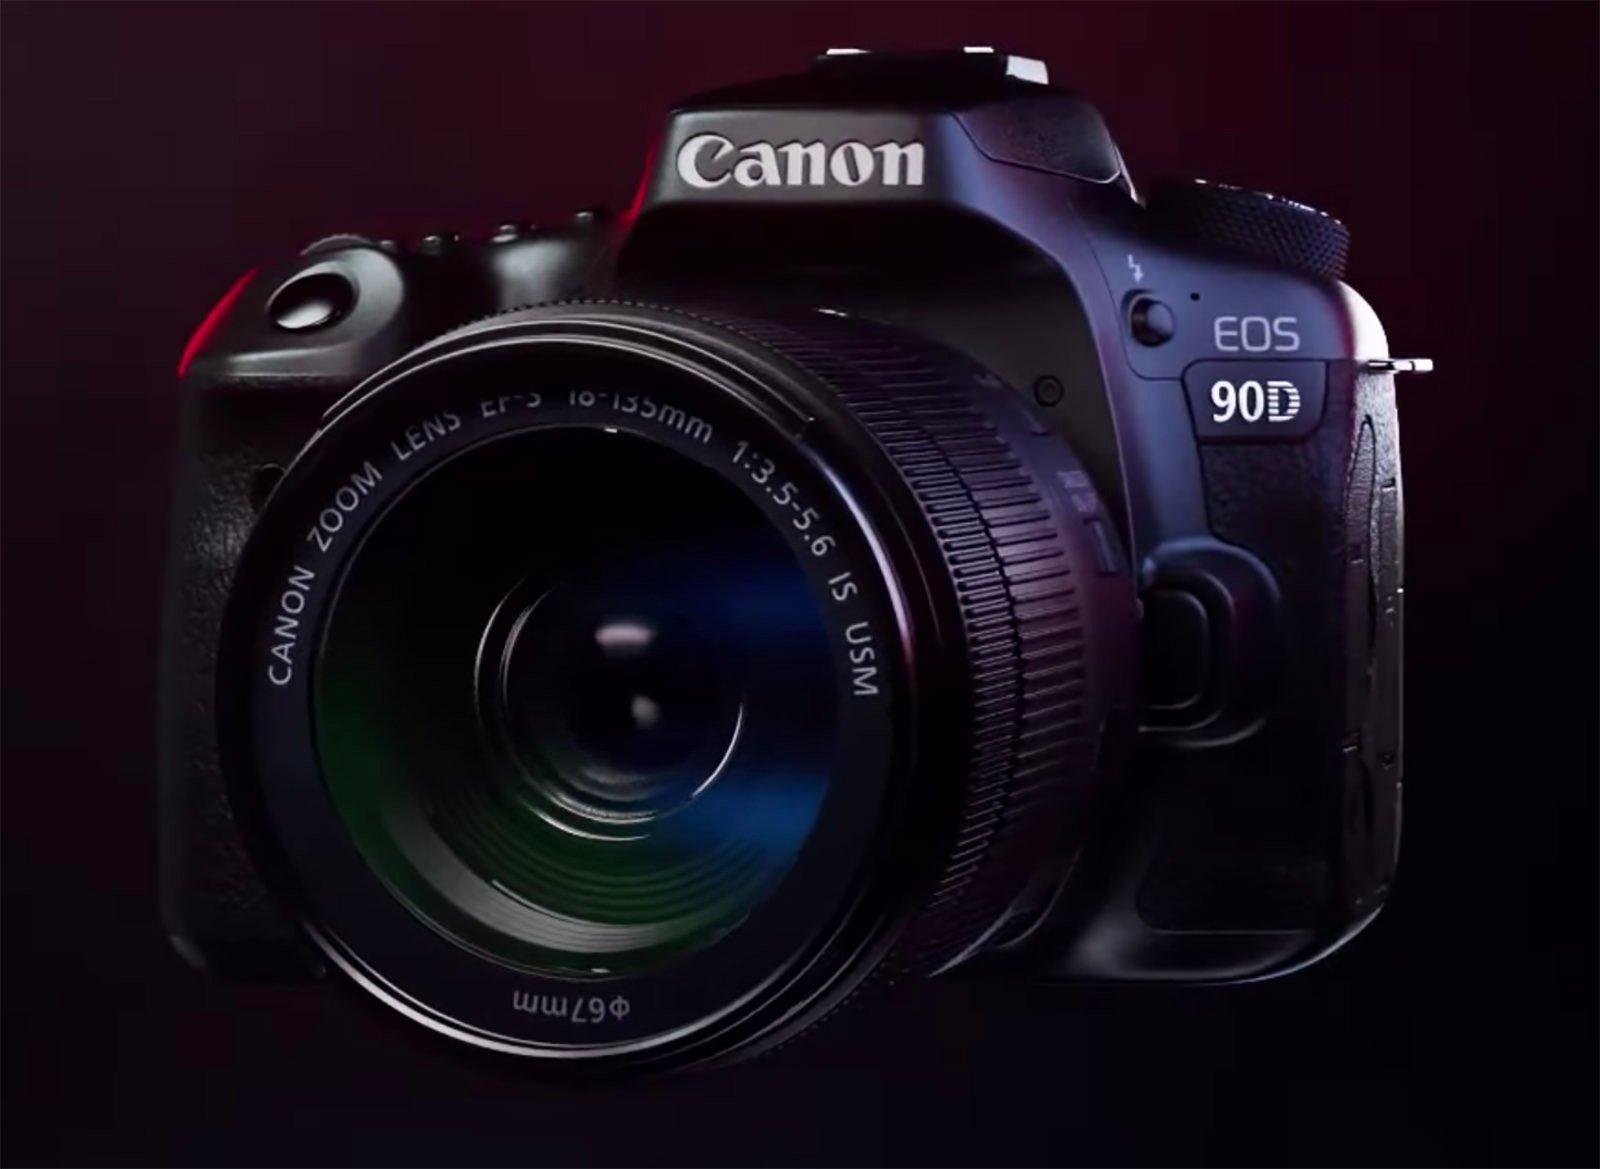 Canon 90D Promo Video Leaked: 32.5MP Sensor, 10fps, 4K Video